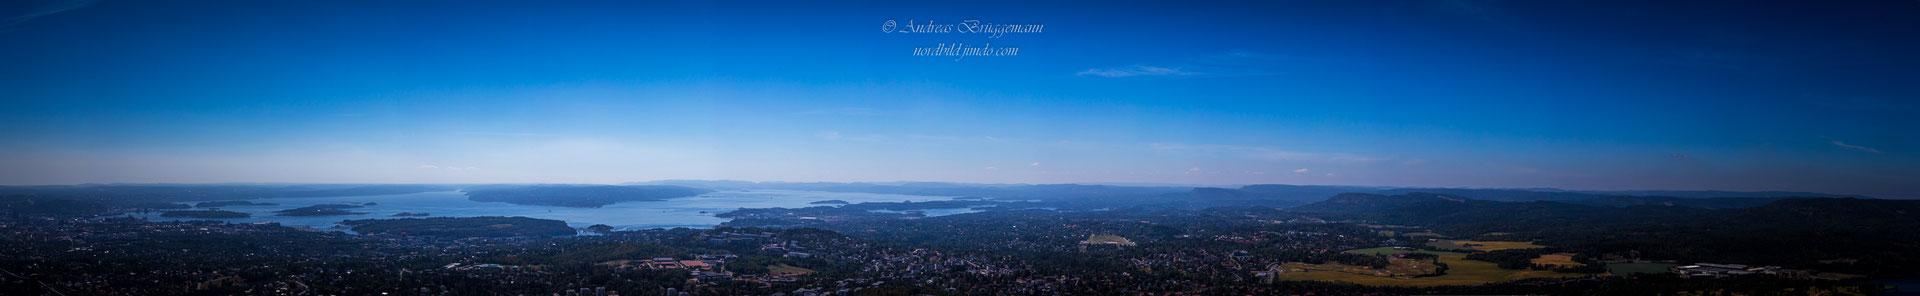 Blick über den Oslo-Fjord